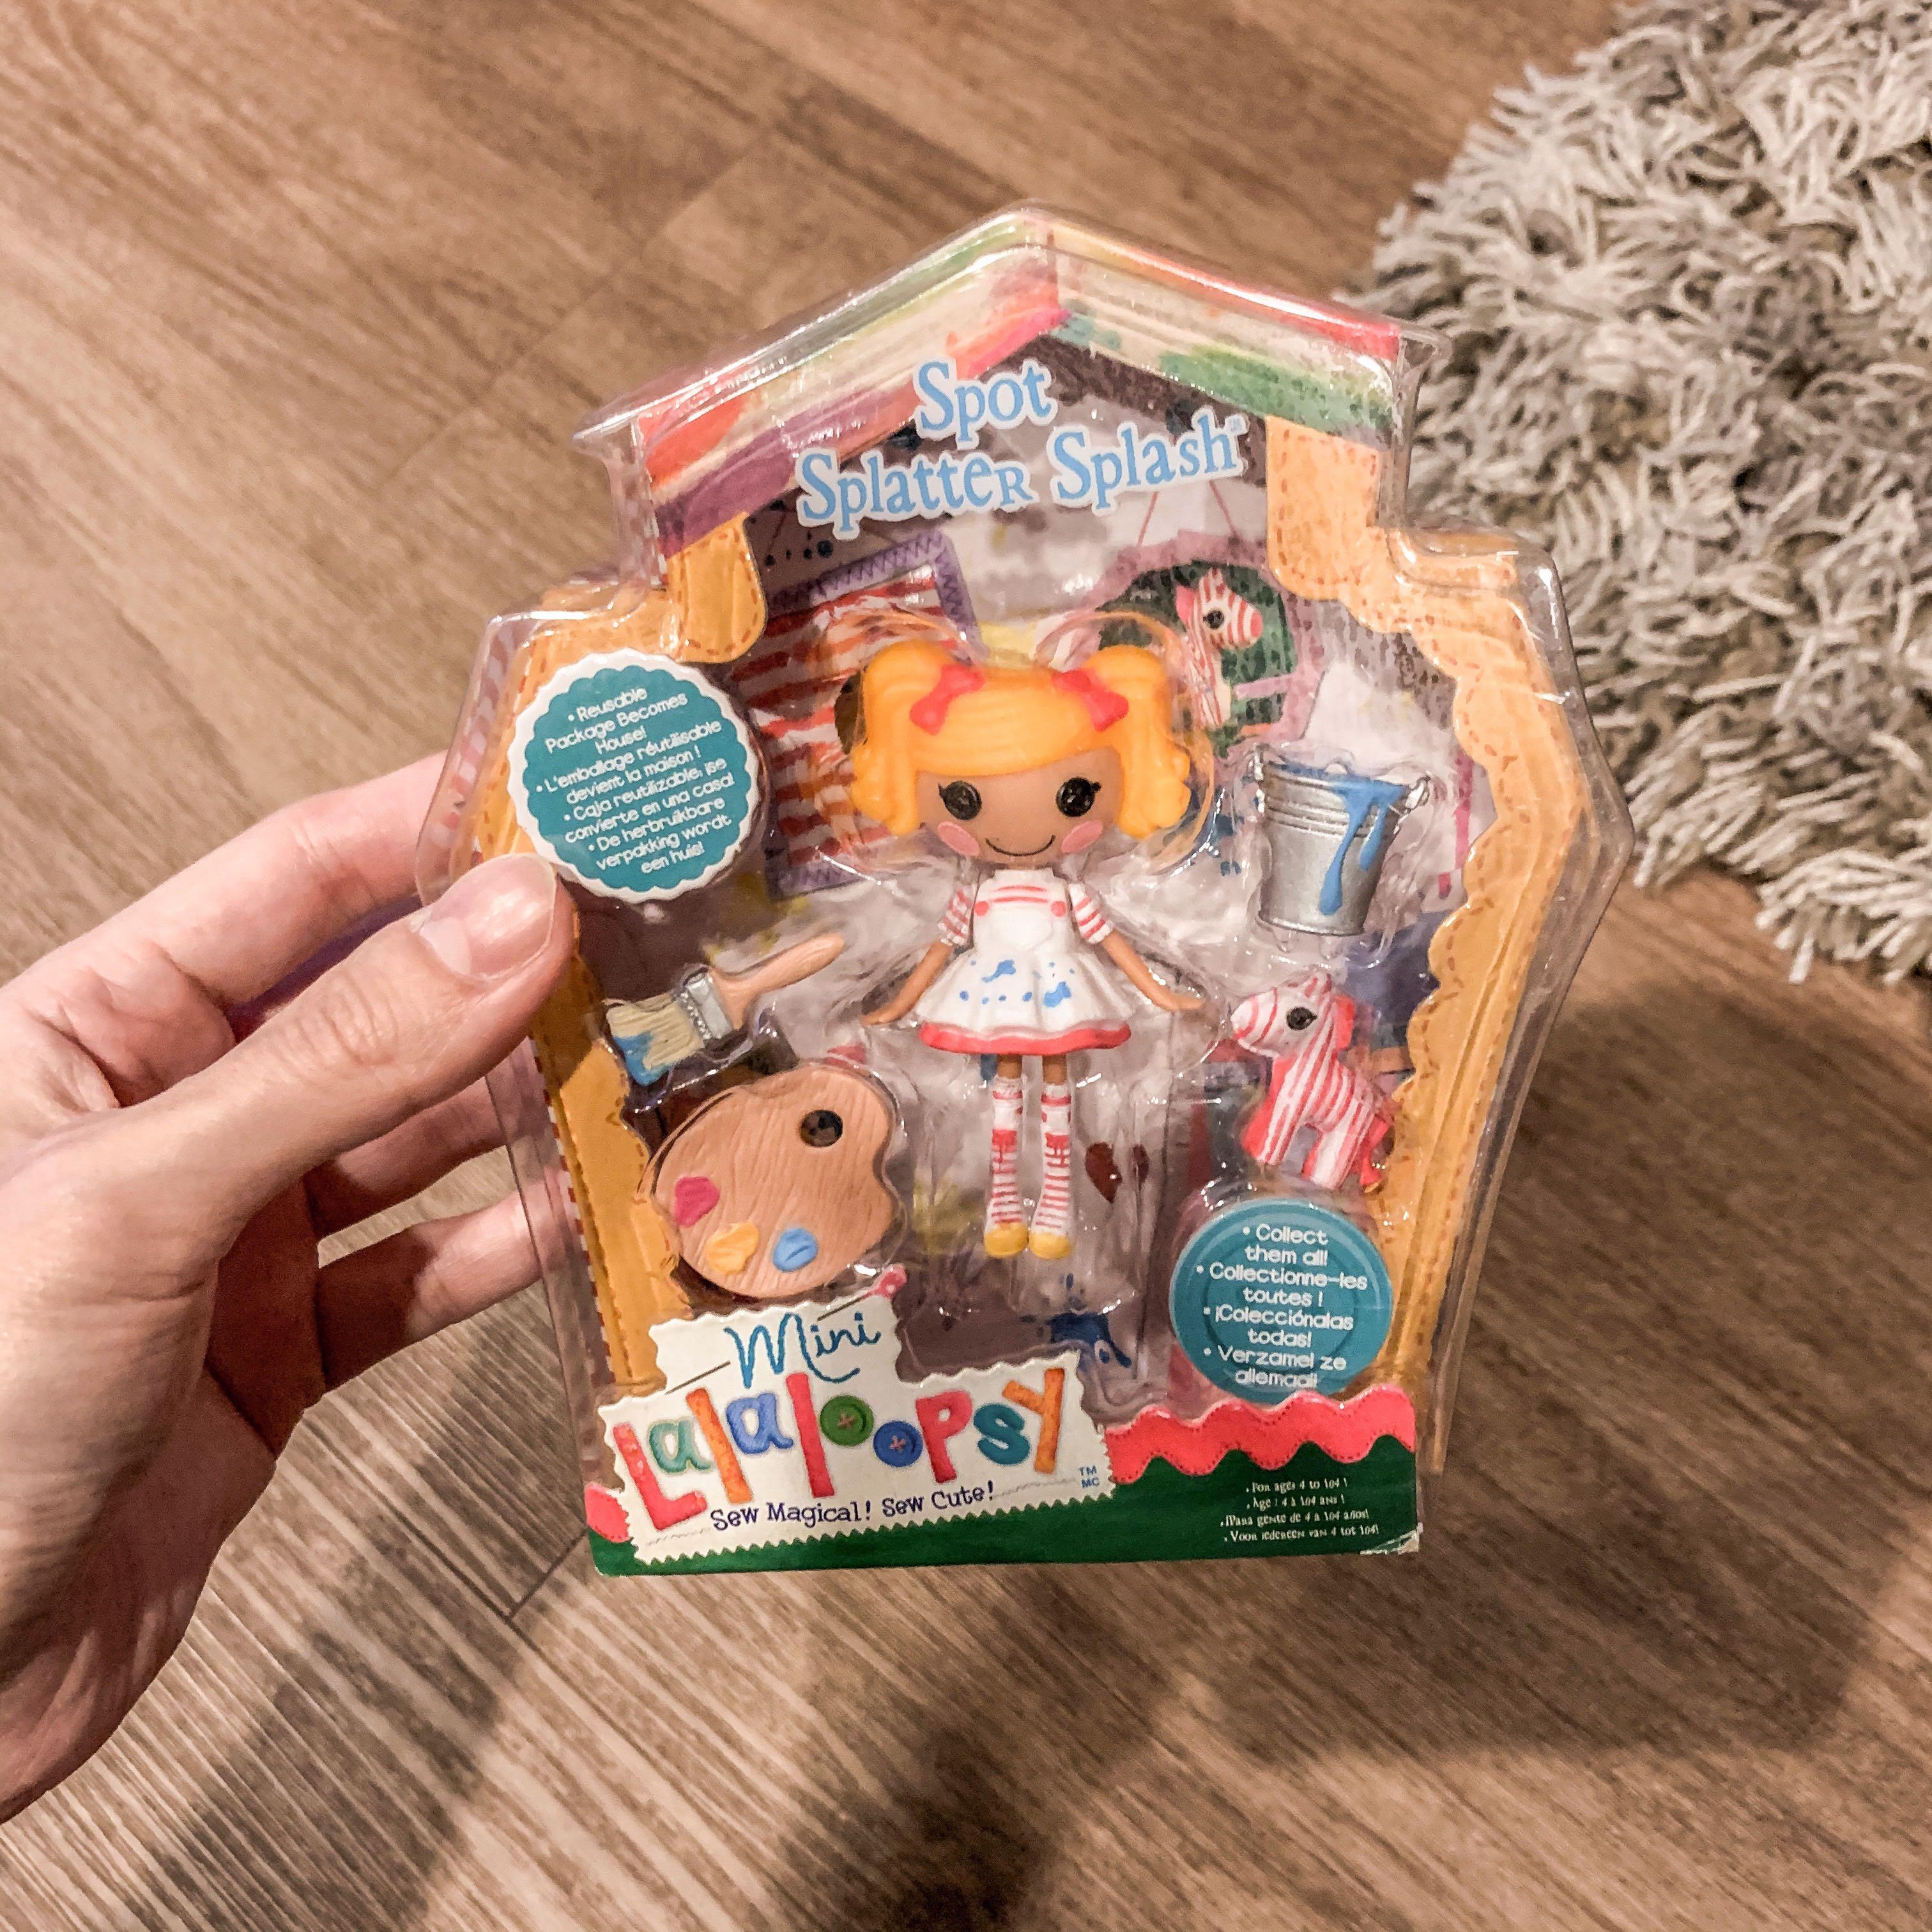 Spot Splatter Splash Babies Doll Lalaloopsy Sew Magical Sew Cute